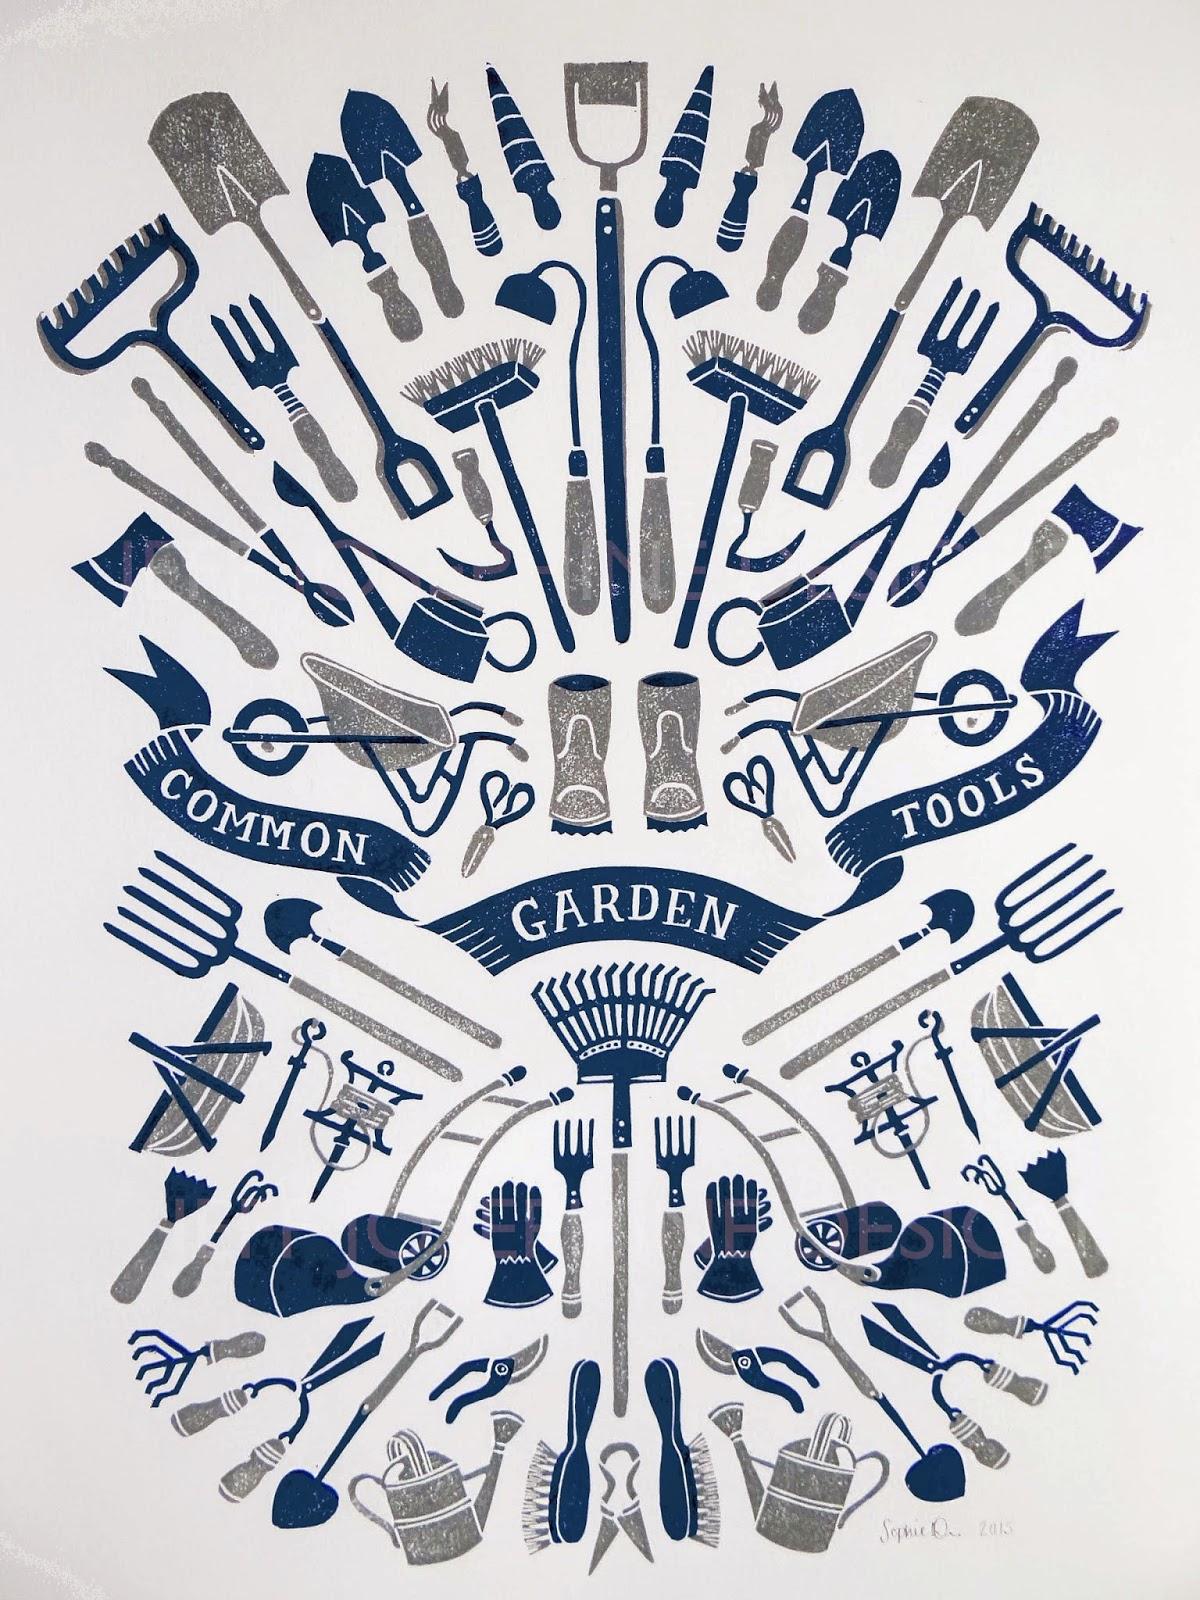 Jeff Josephine Designs News Common Garden Tools Linocut Print